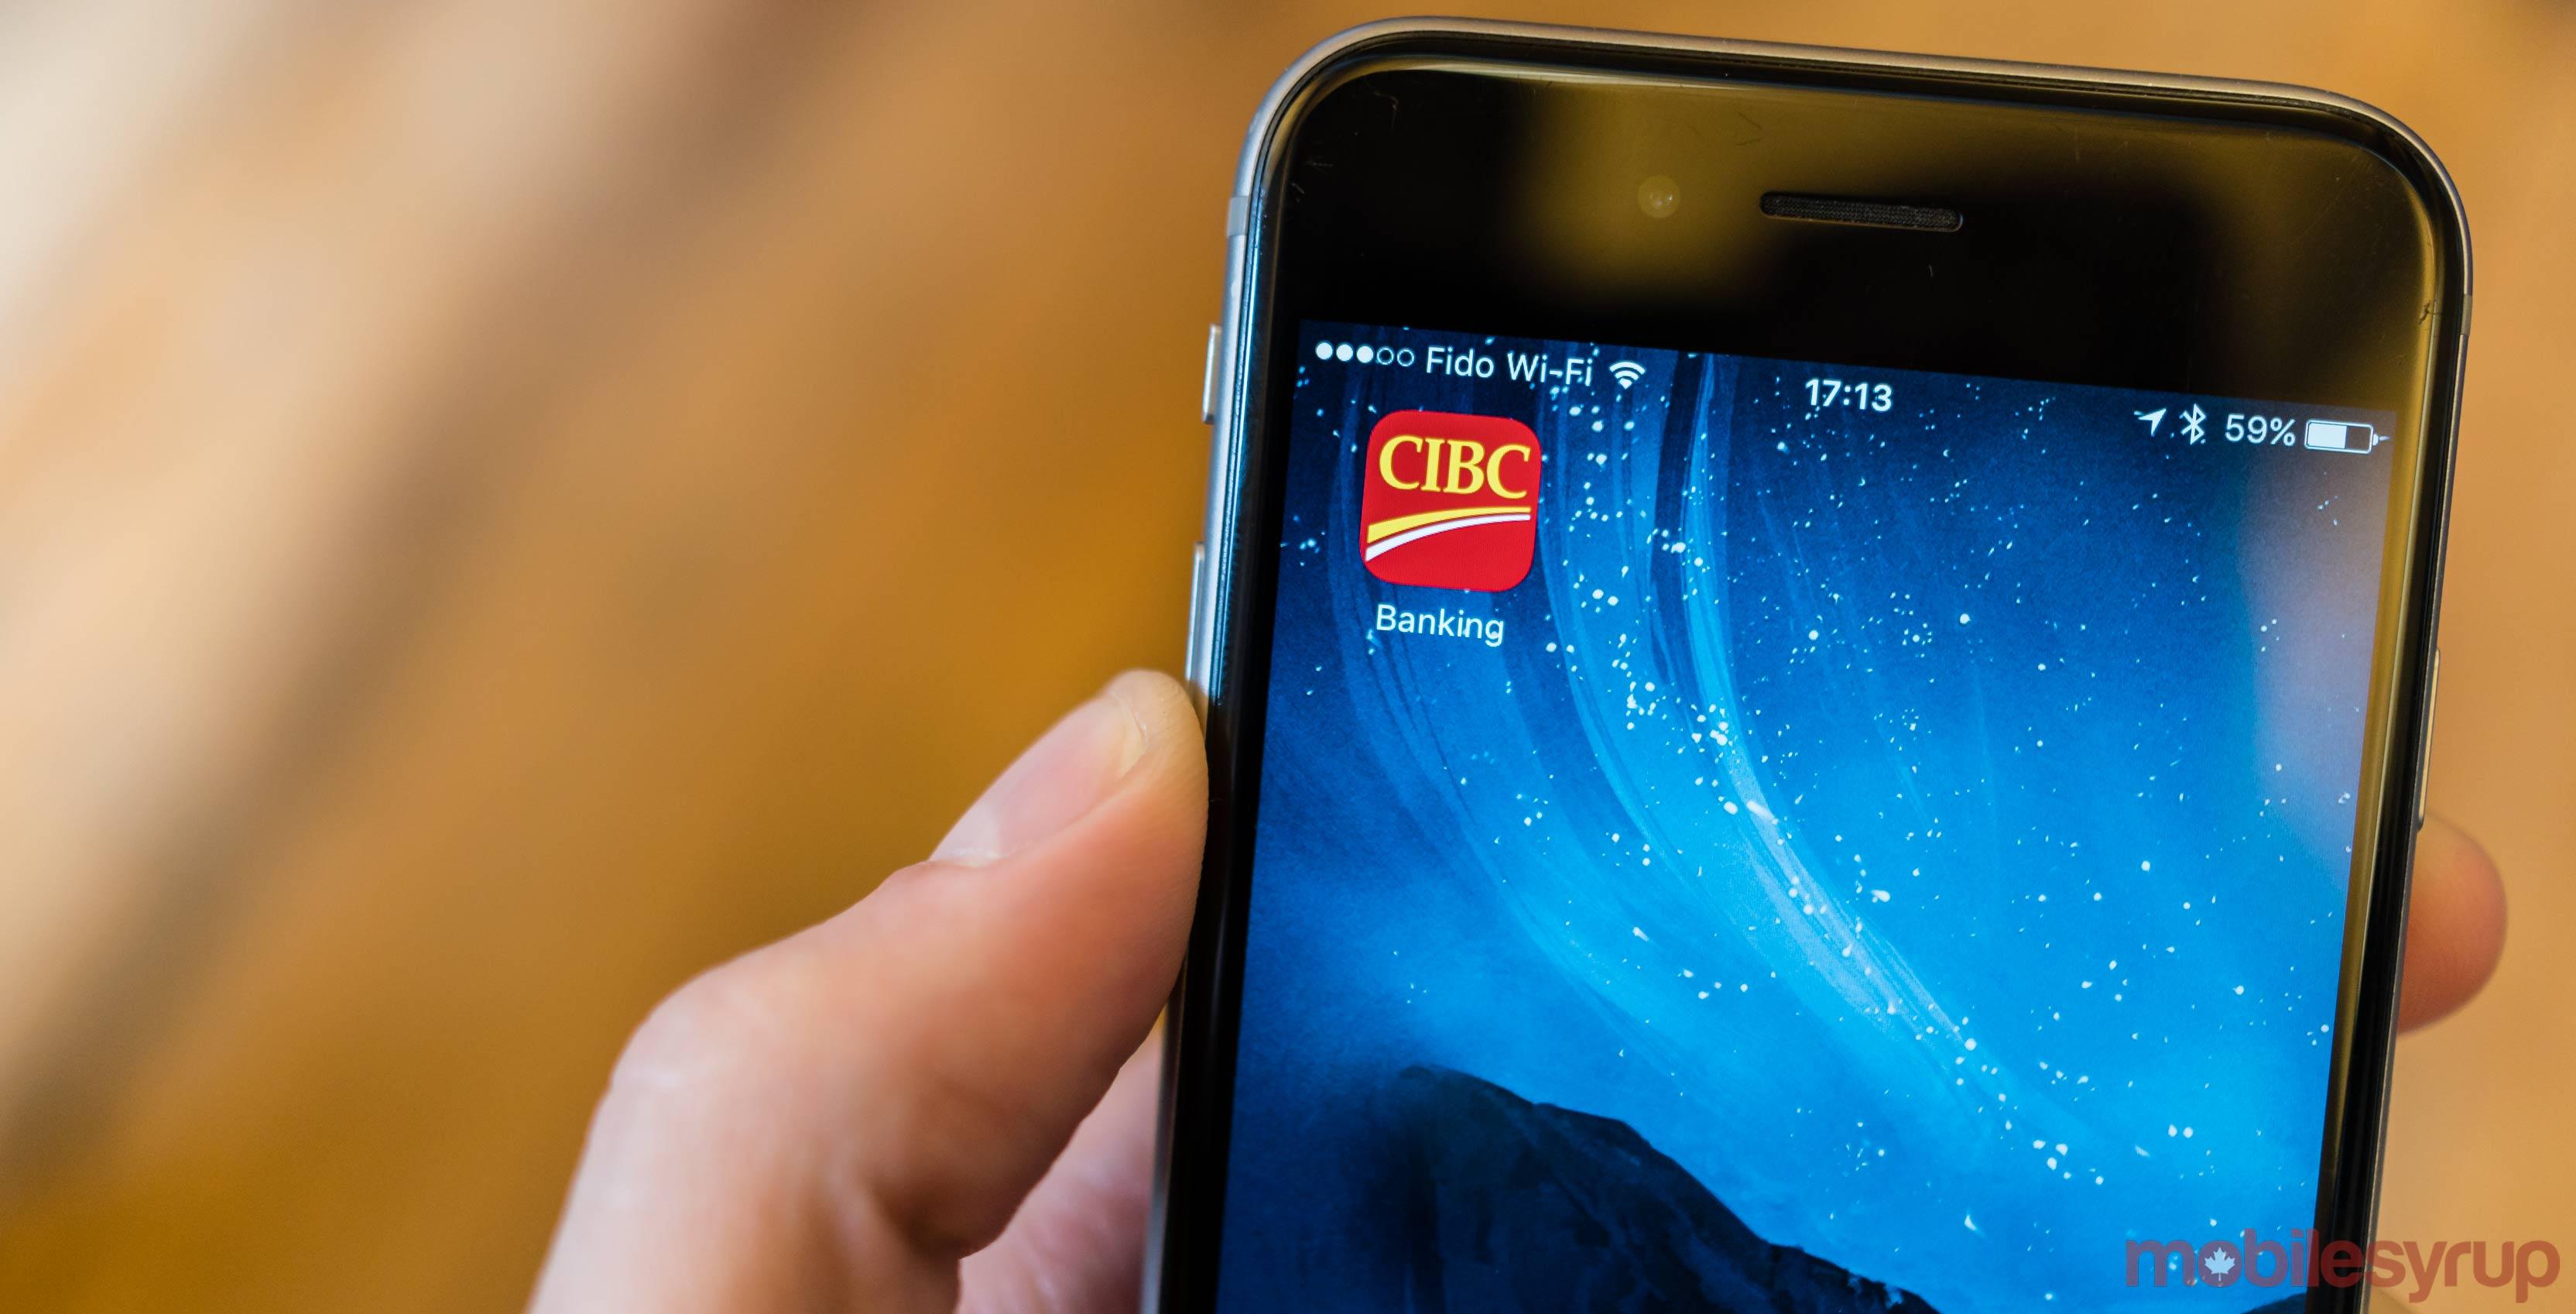 CIBC Mobile Banking app icon on iOS